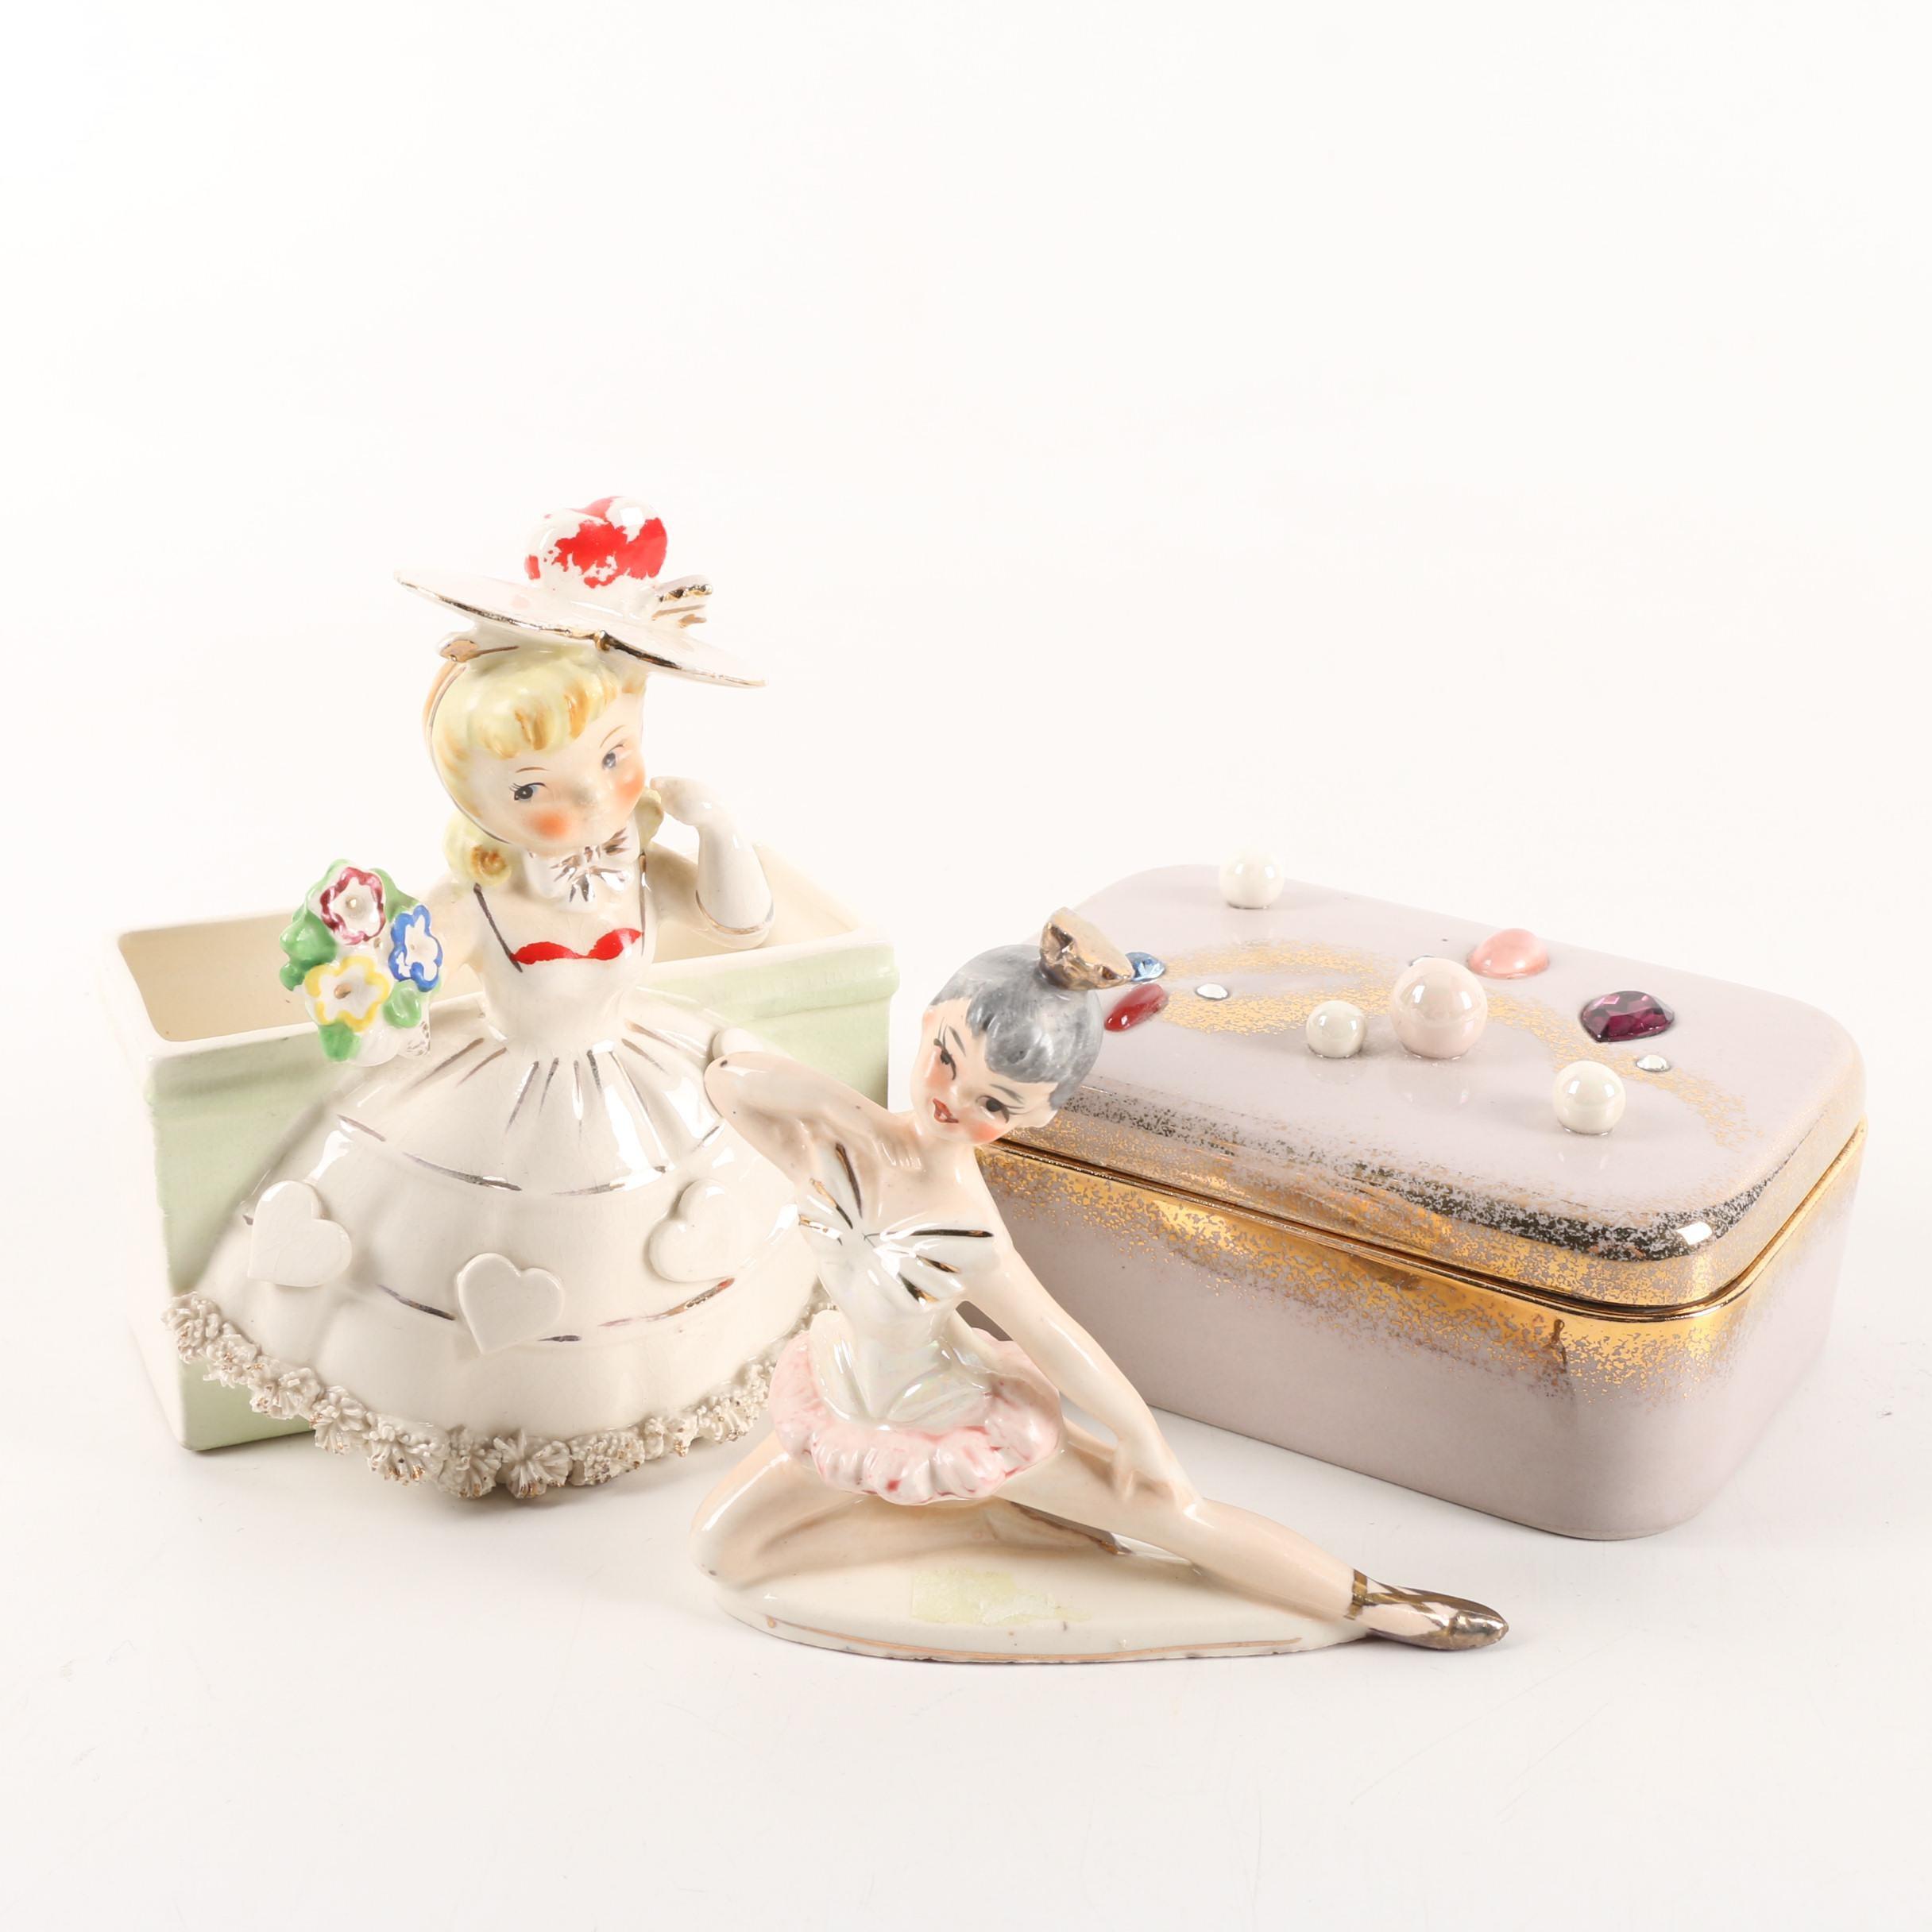 Vintage Ceramic Decor Including Trinket Box and Figurines